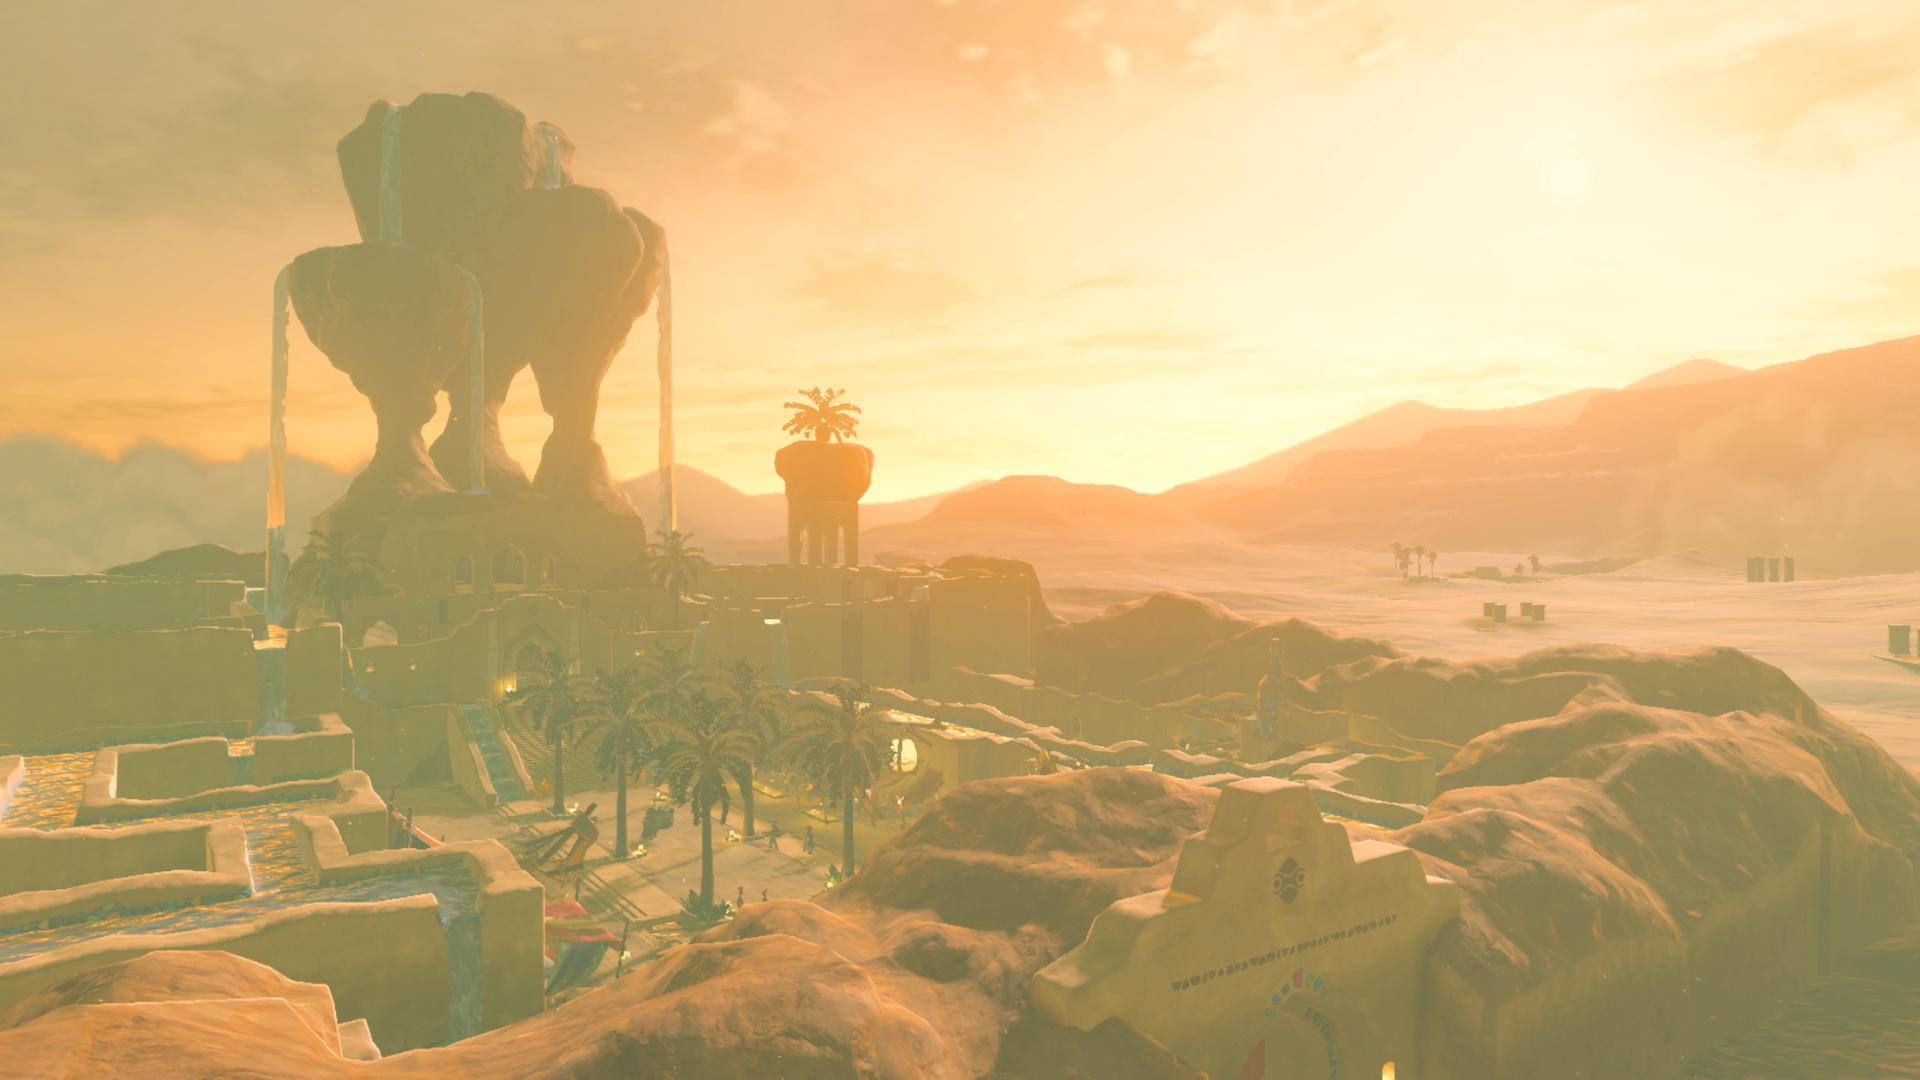 The Legend of Zelda: Breath of the Wild image 28